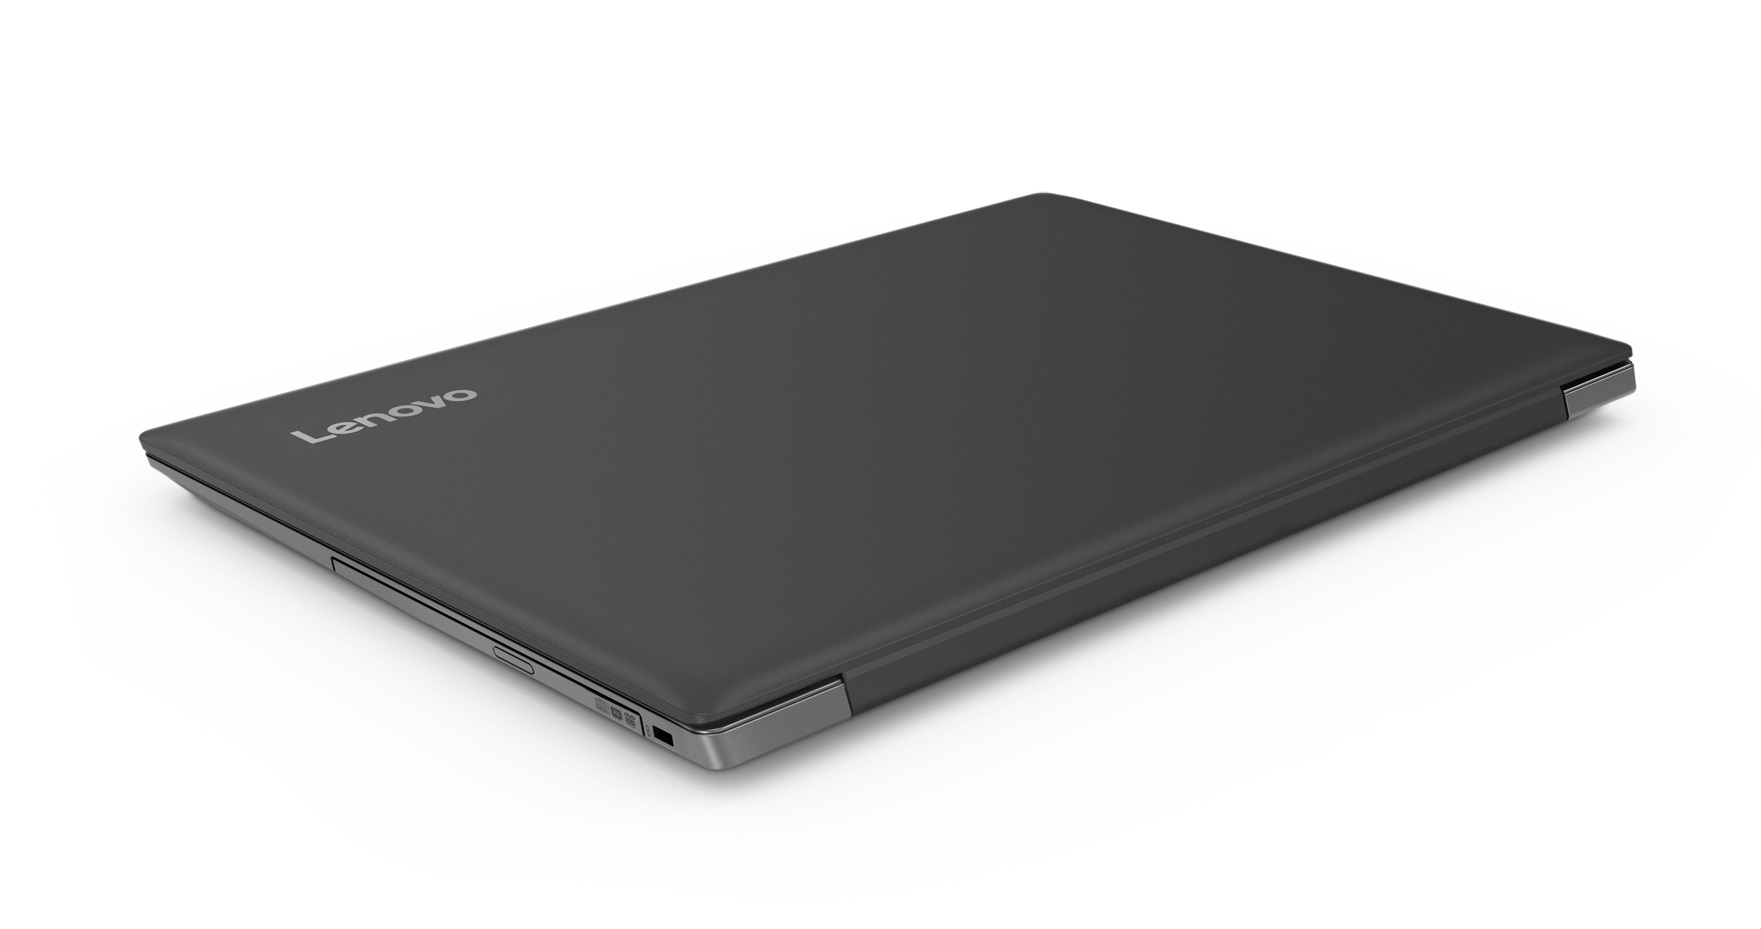 Фото  Ноутбук Lenovo ideapad 330-15 Onyx Black (81D100KARA)